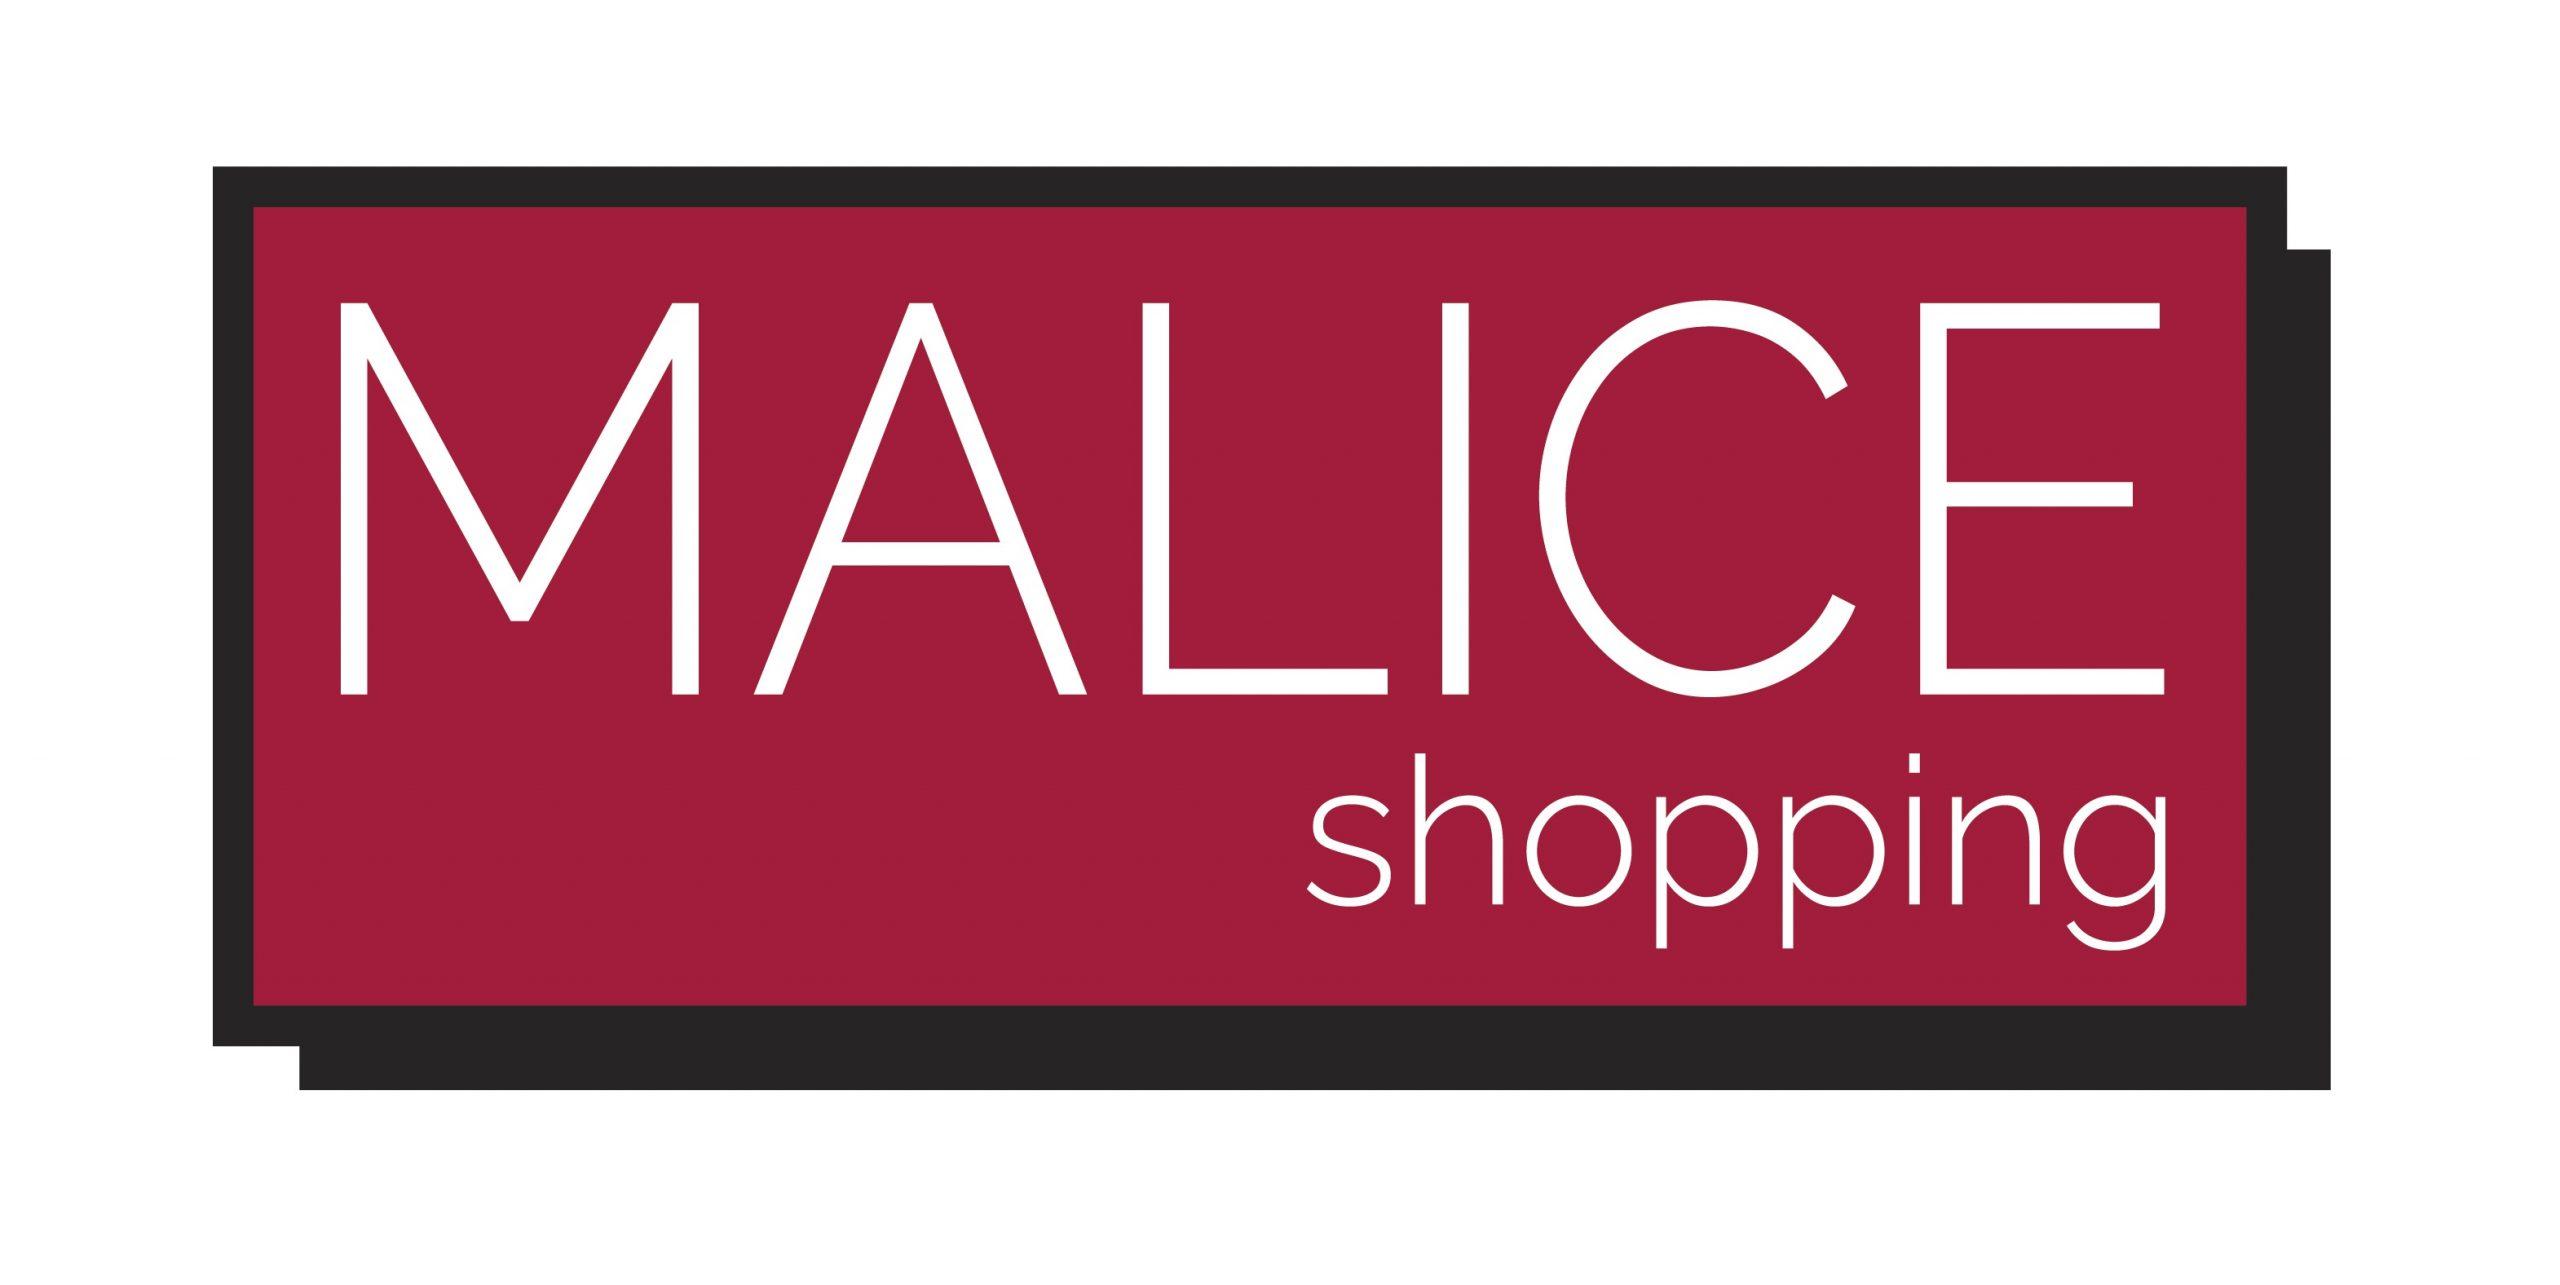 Shopping Malice